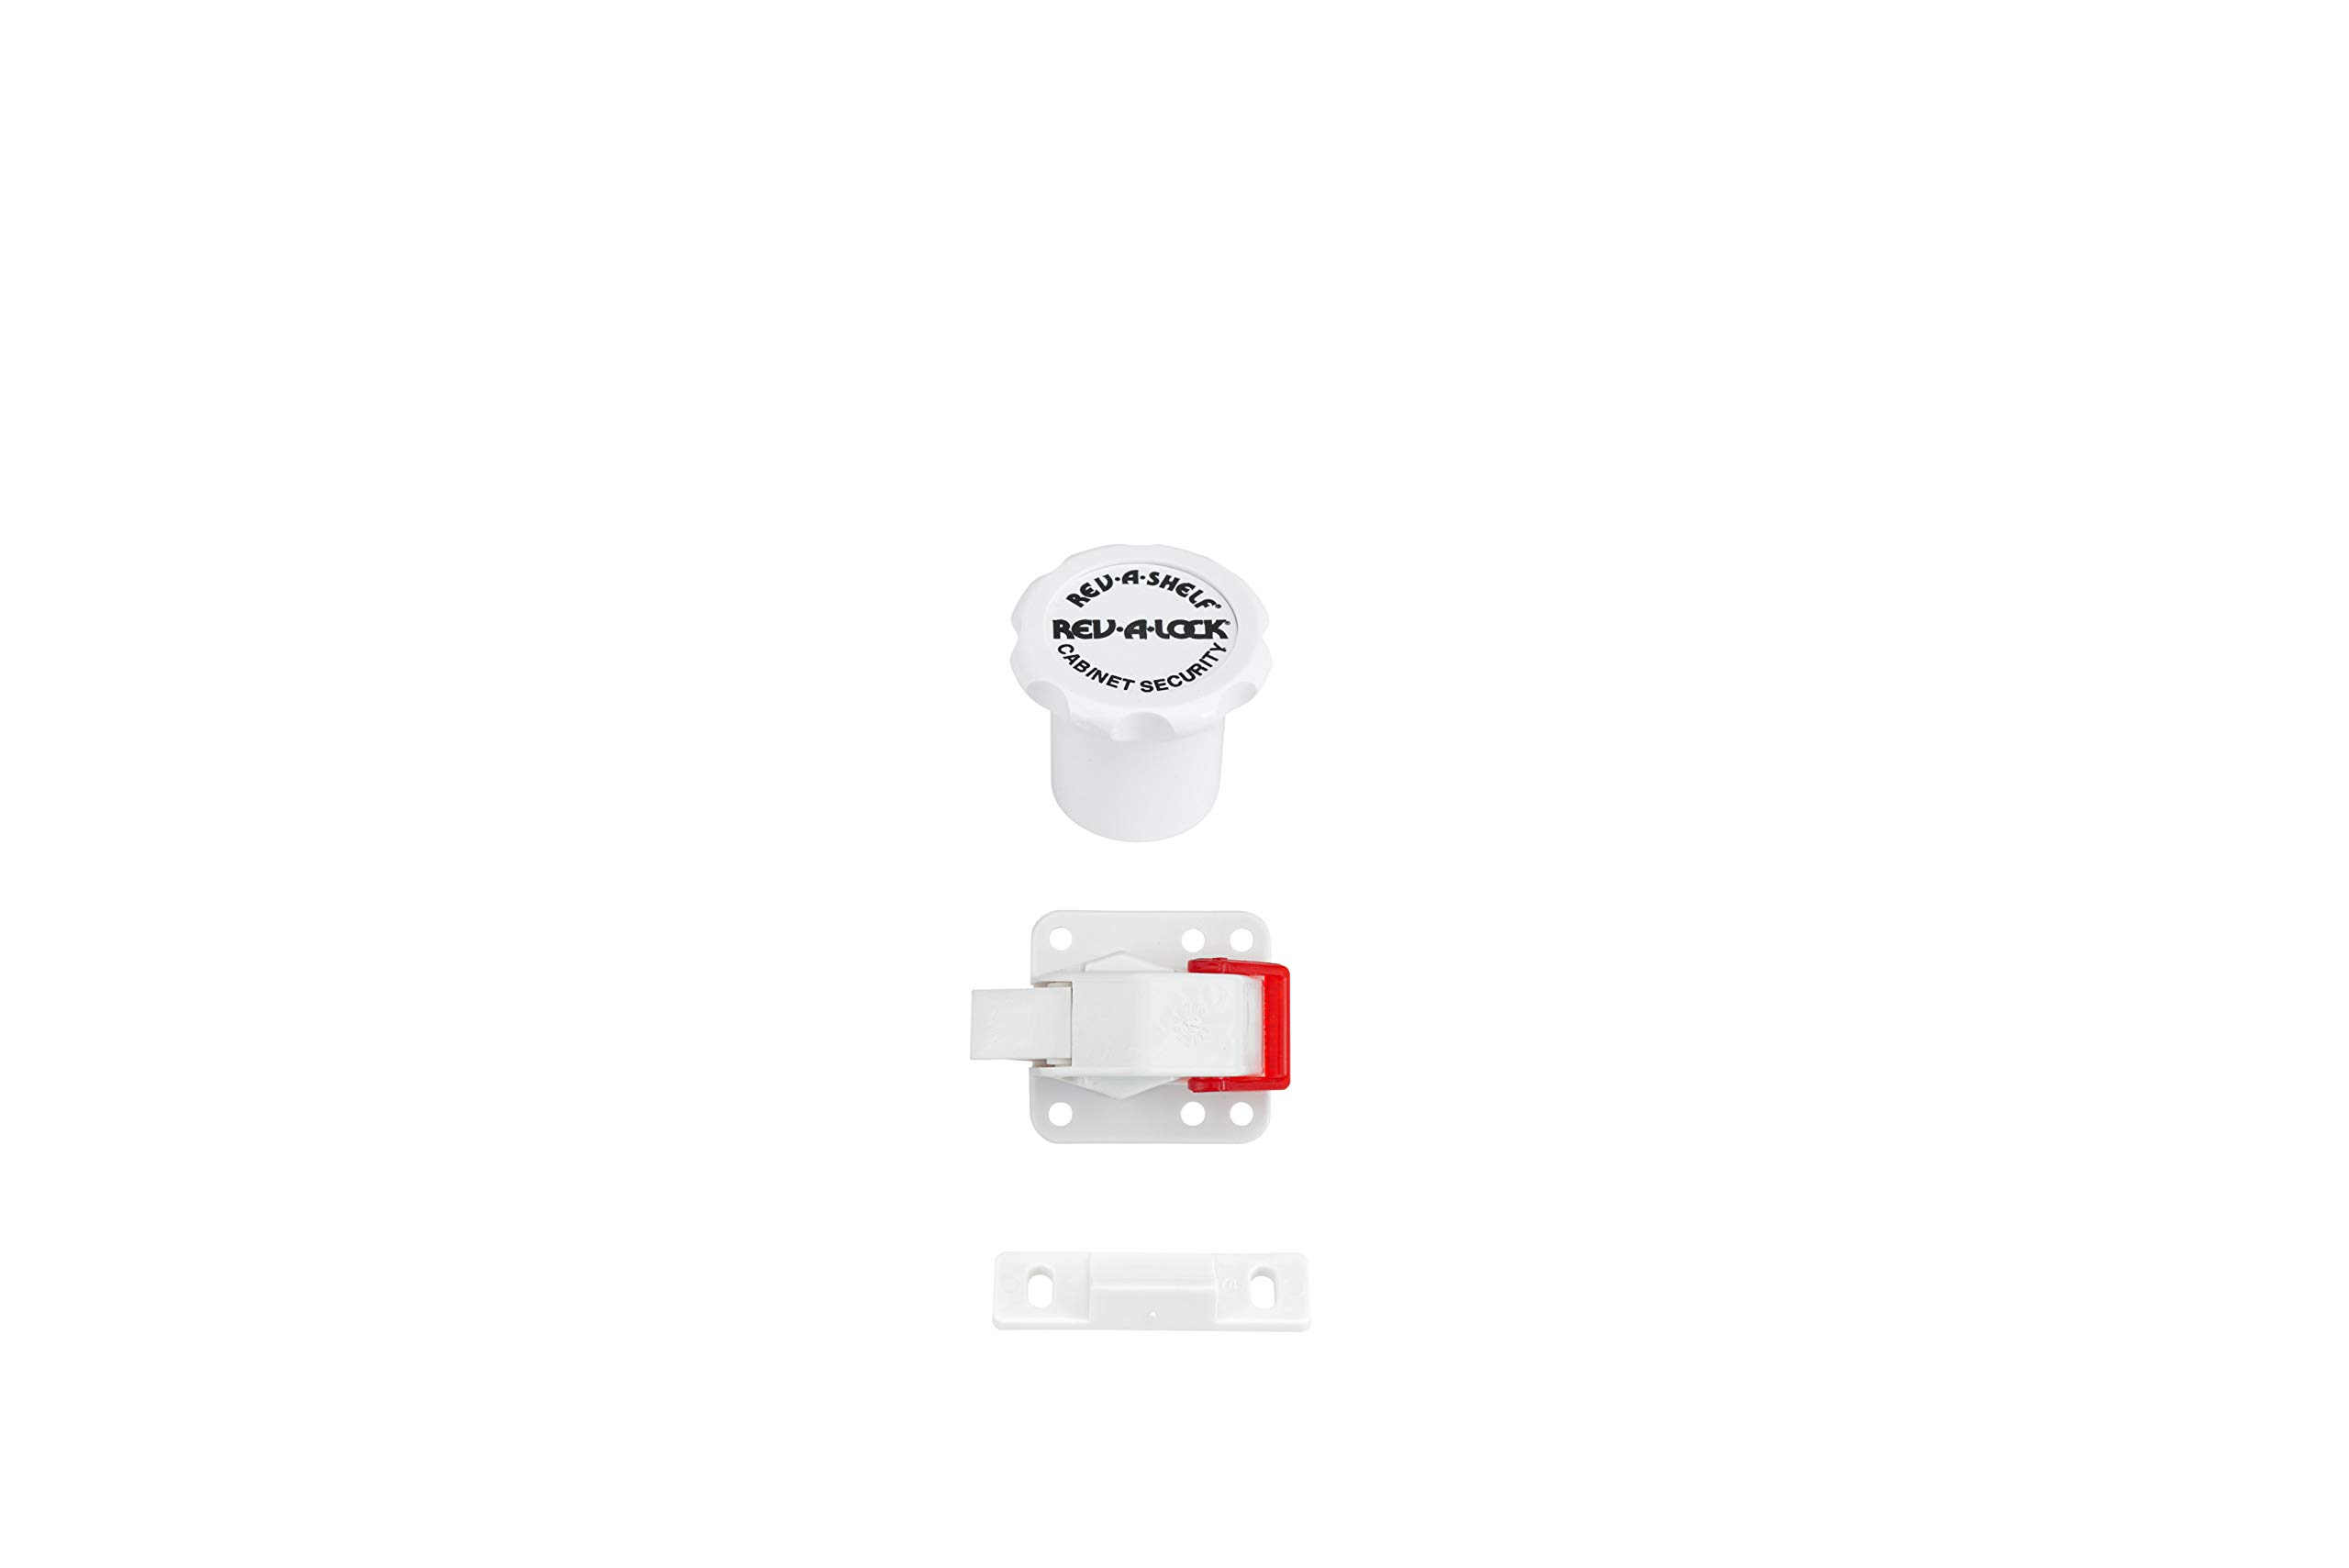 Rev-A-Shelf - RAL-101-1 - Rev-A-Lock Cabinet Security System by Rev-A-Shelf